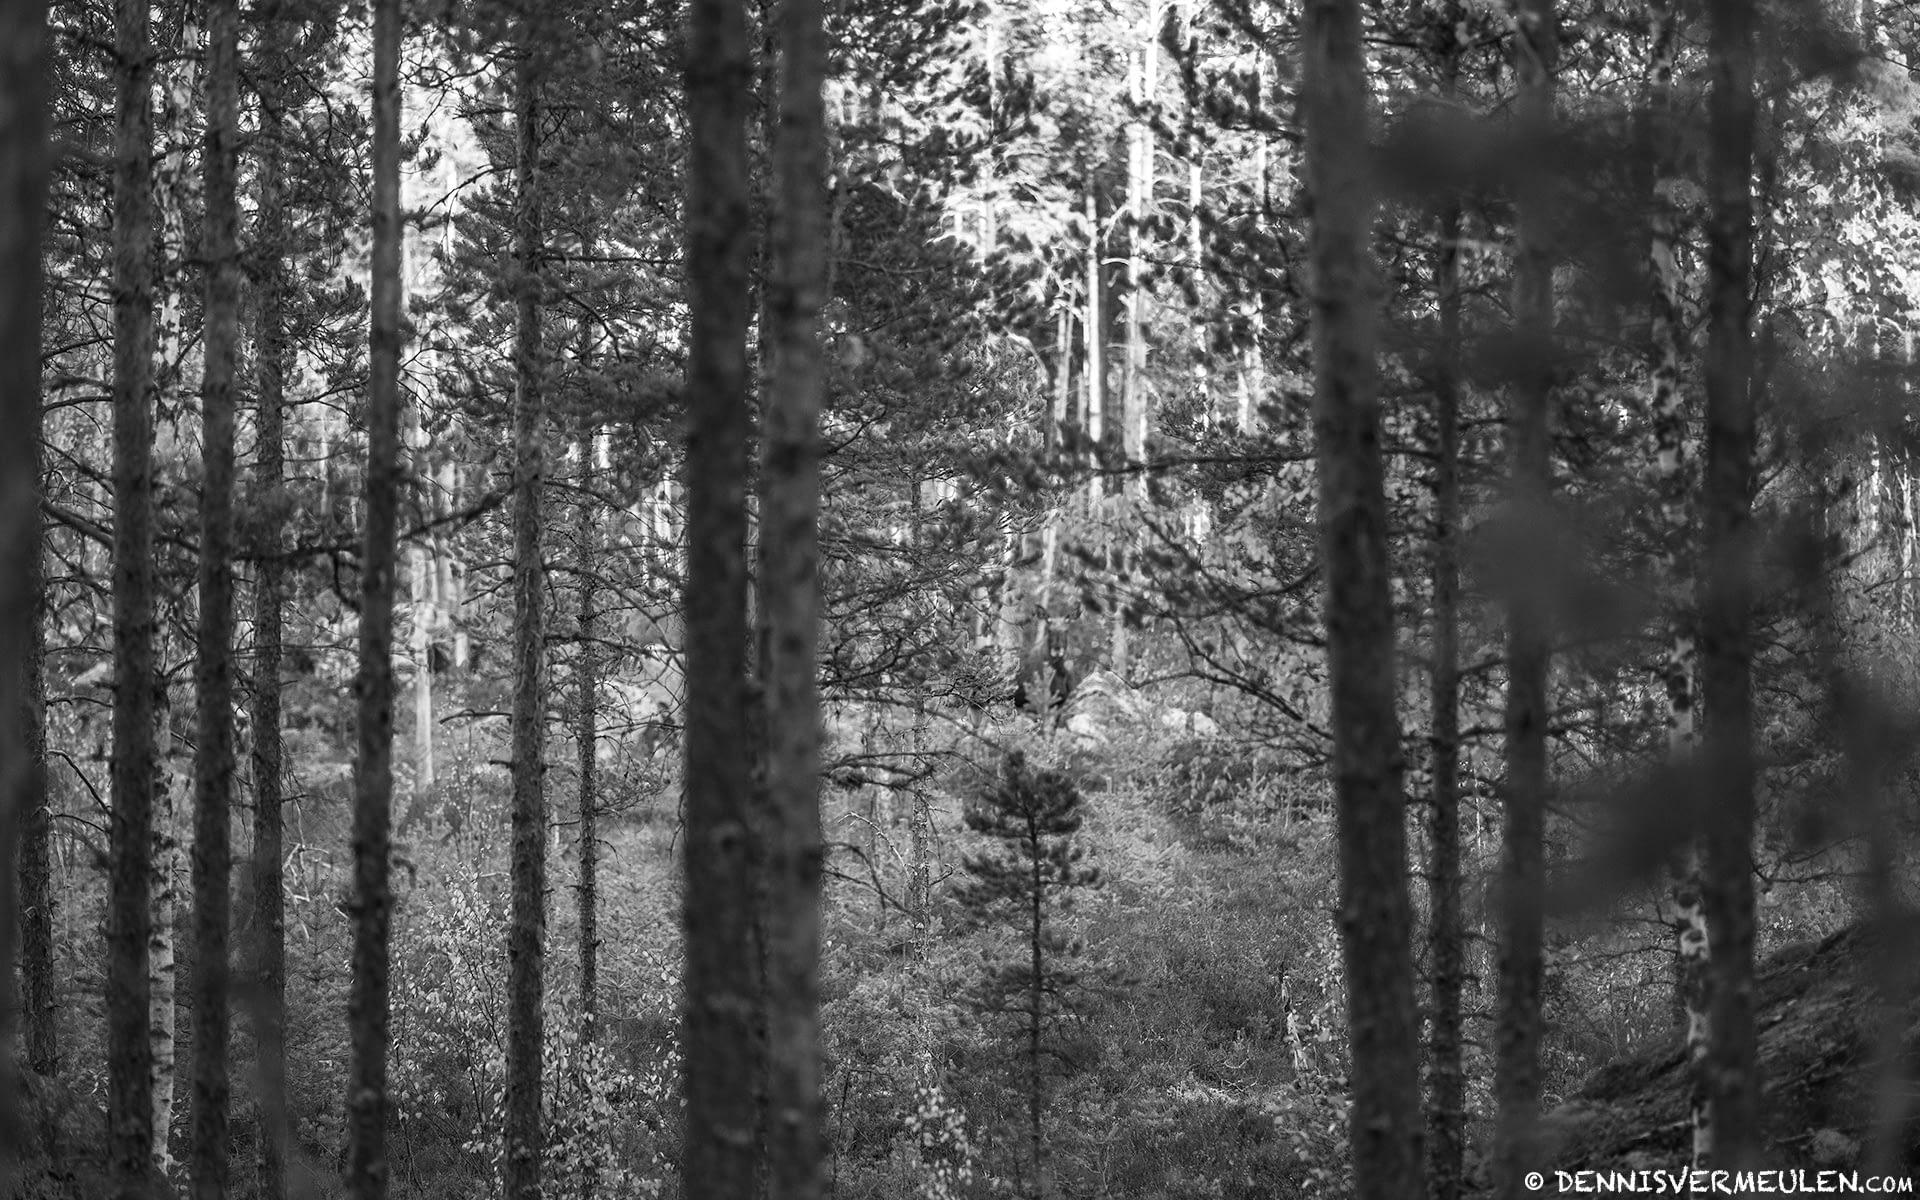 Dennis Vermeulen Photography - Natur i Forest